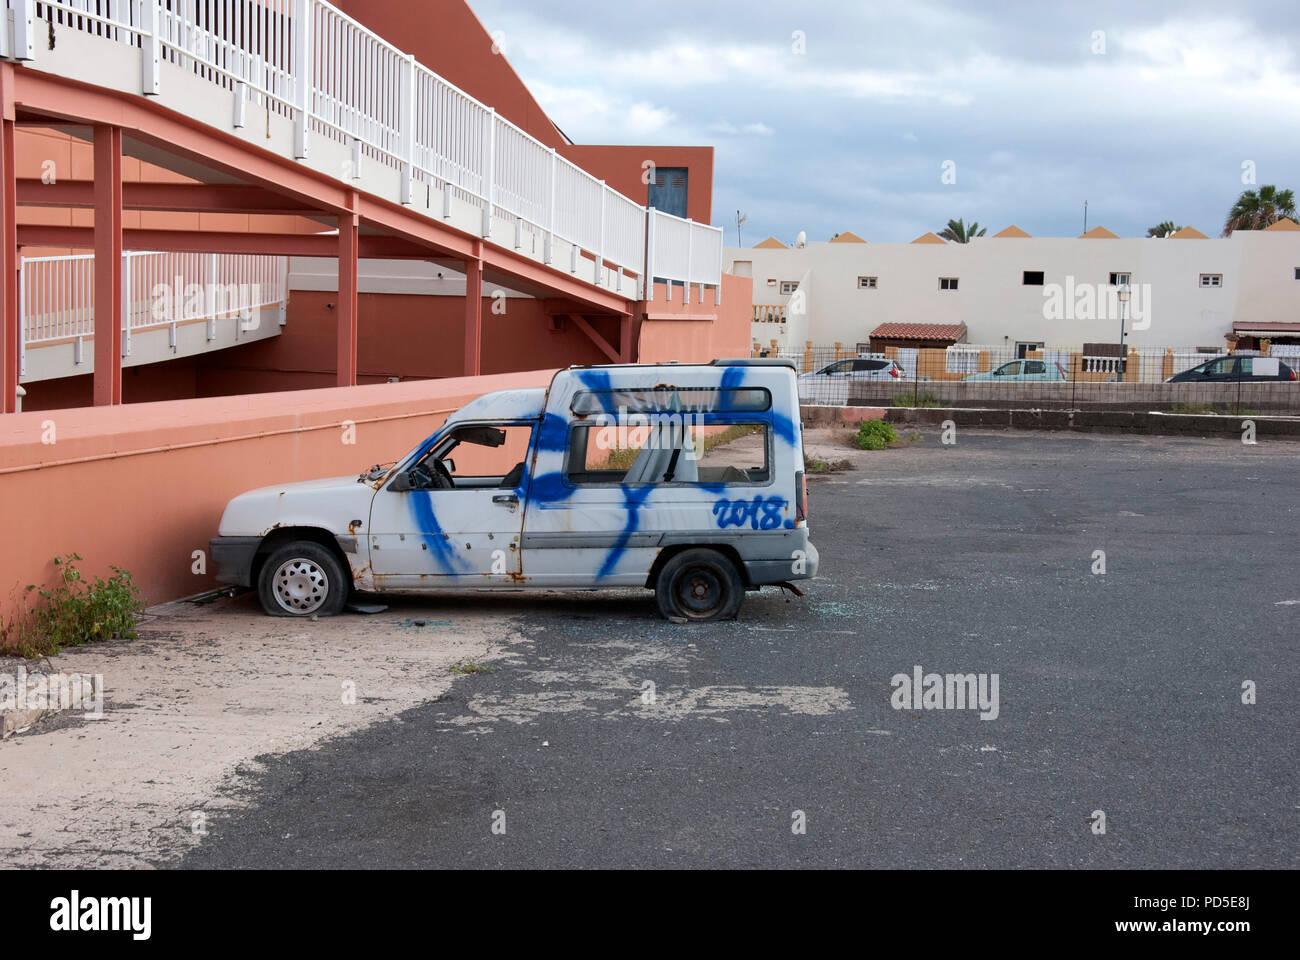 Abandoned and Vandalised White Renault Express Motor Car nearside drivers side view of abandoned dilapidated vandalised damaged scrap white left hand  - Stock Image